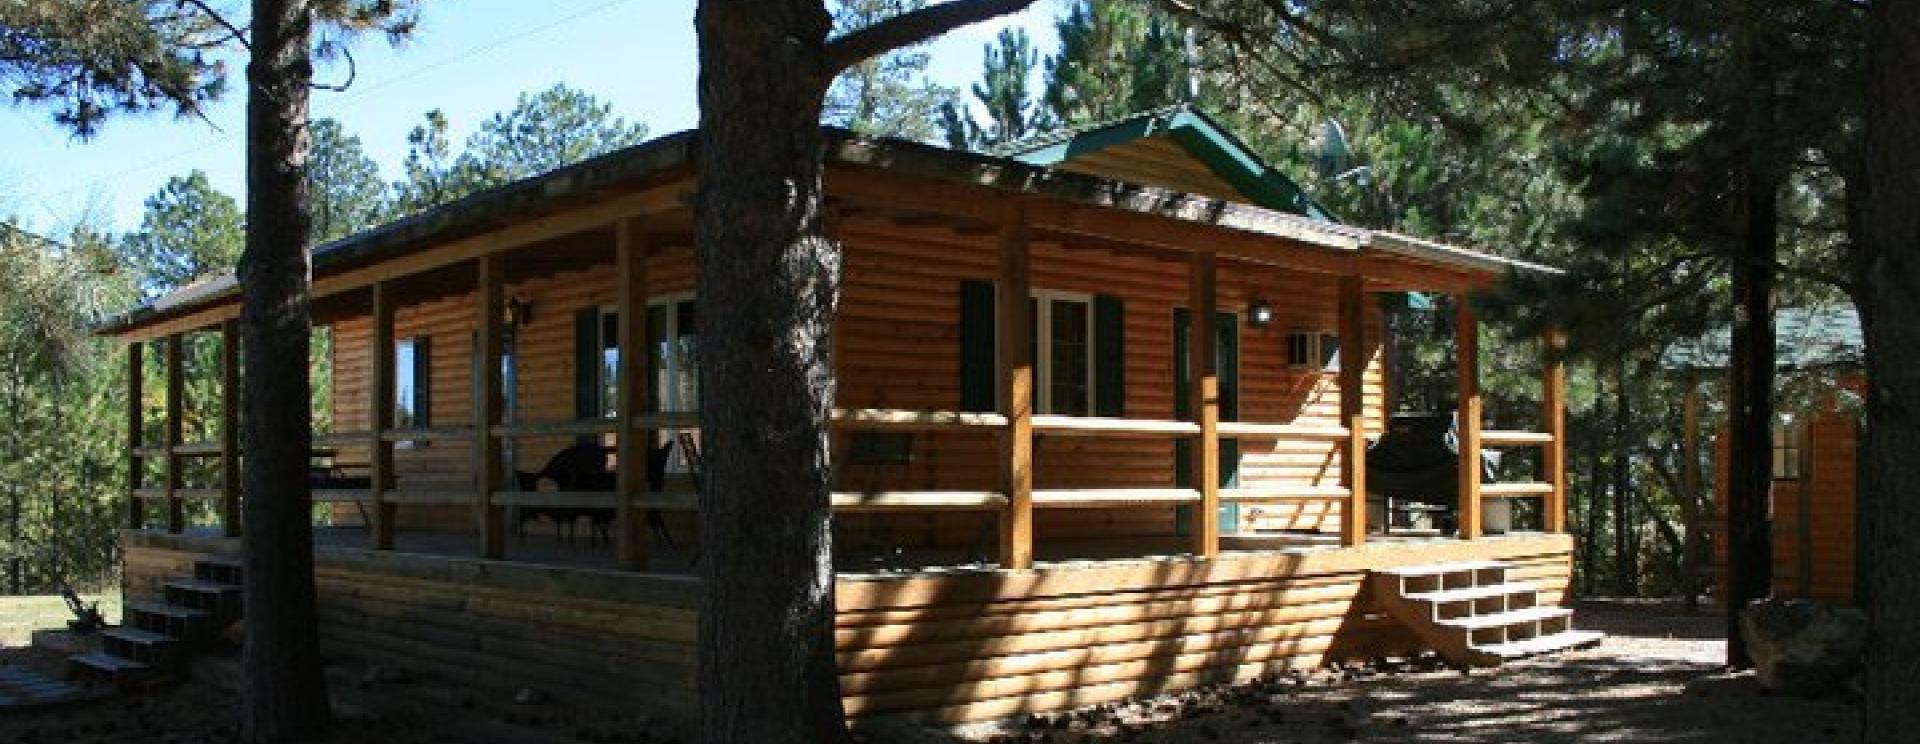 Rush No More RV Park & Campground